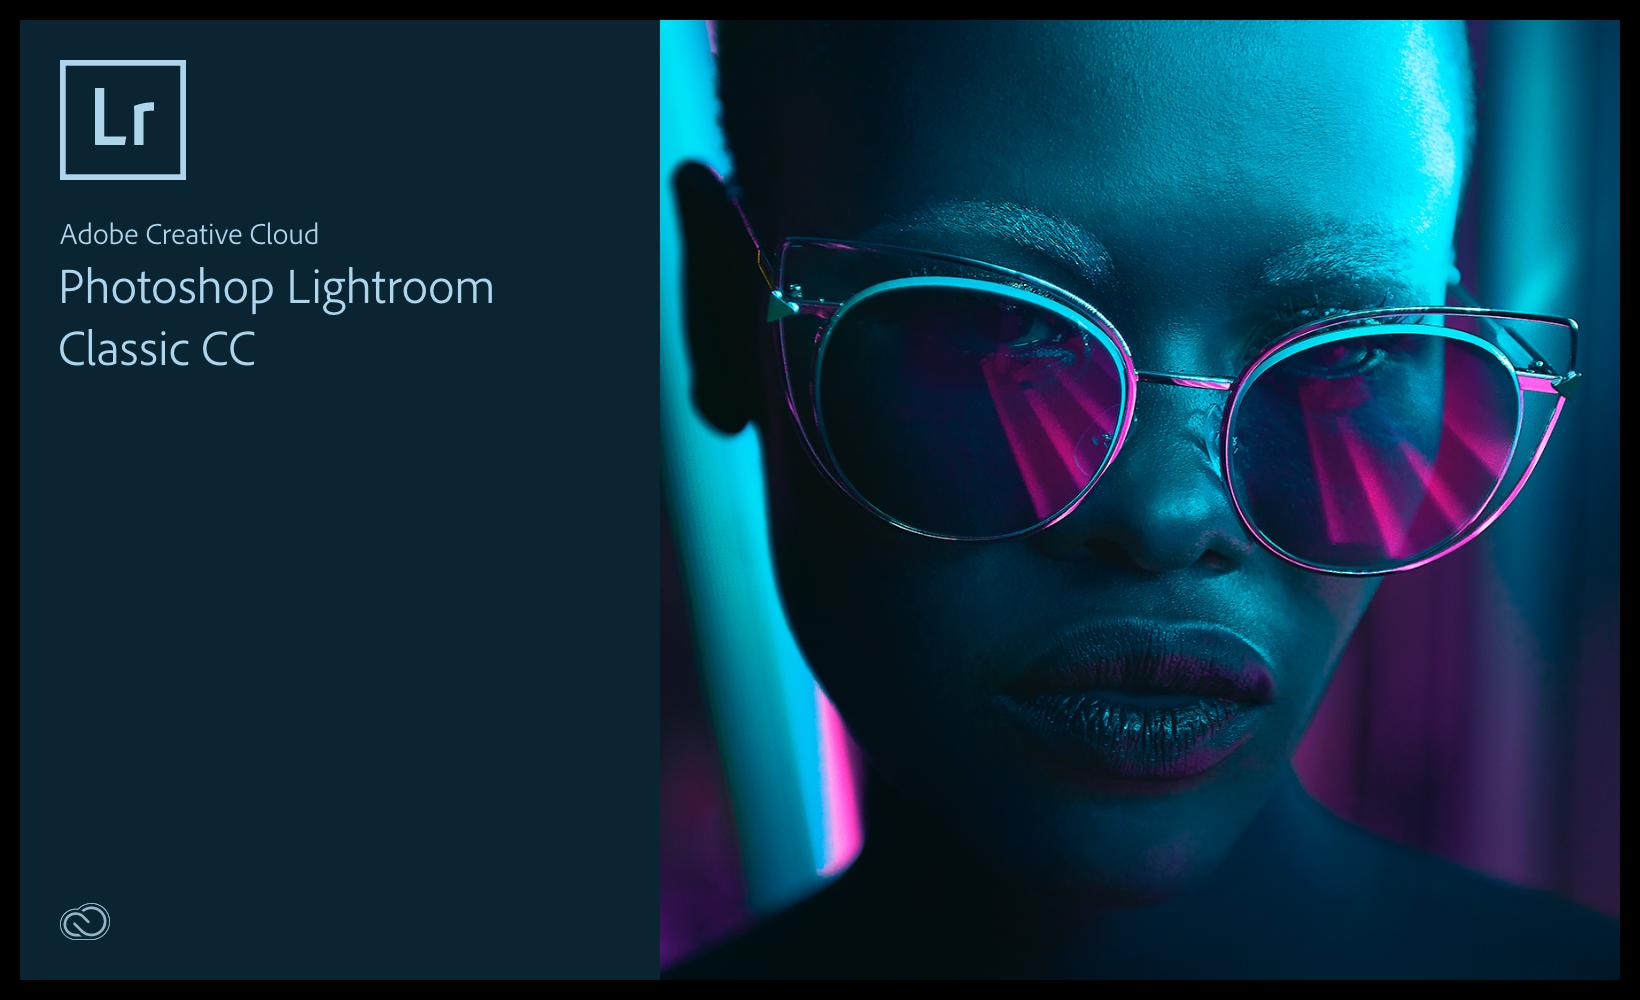 Op 18 oktober 2017 werd Adobe Lightroom Classic CC gereleased, de update van Lightroom CC2015 en Lightroom 6. Image © Adobe